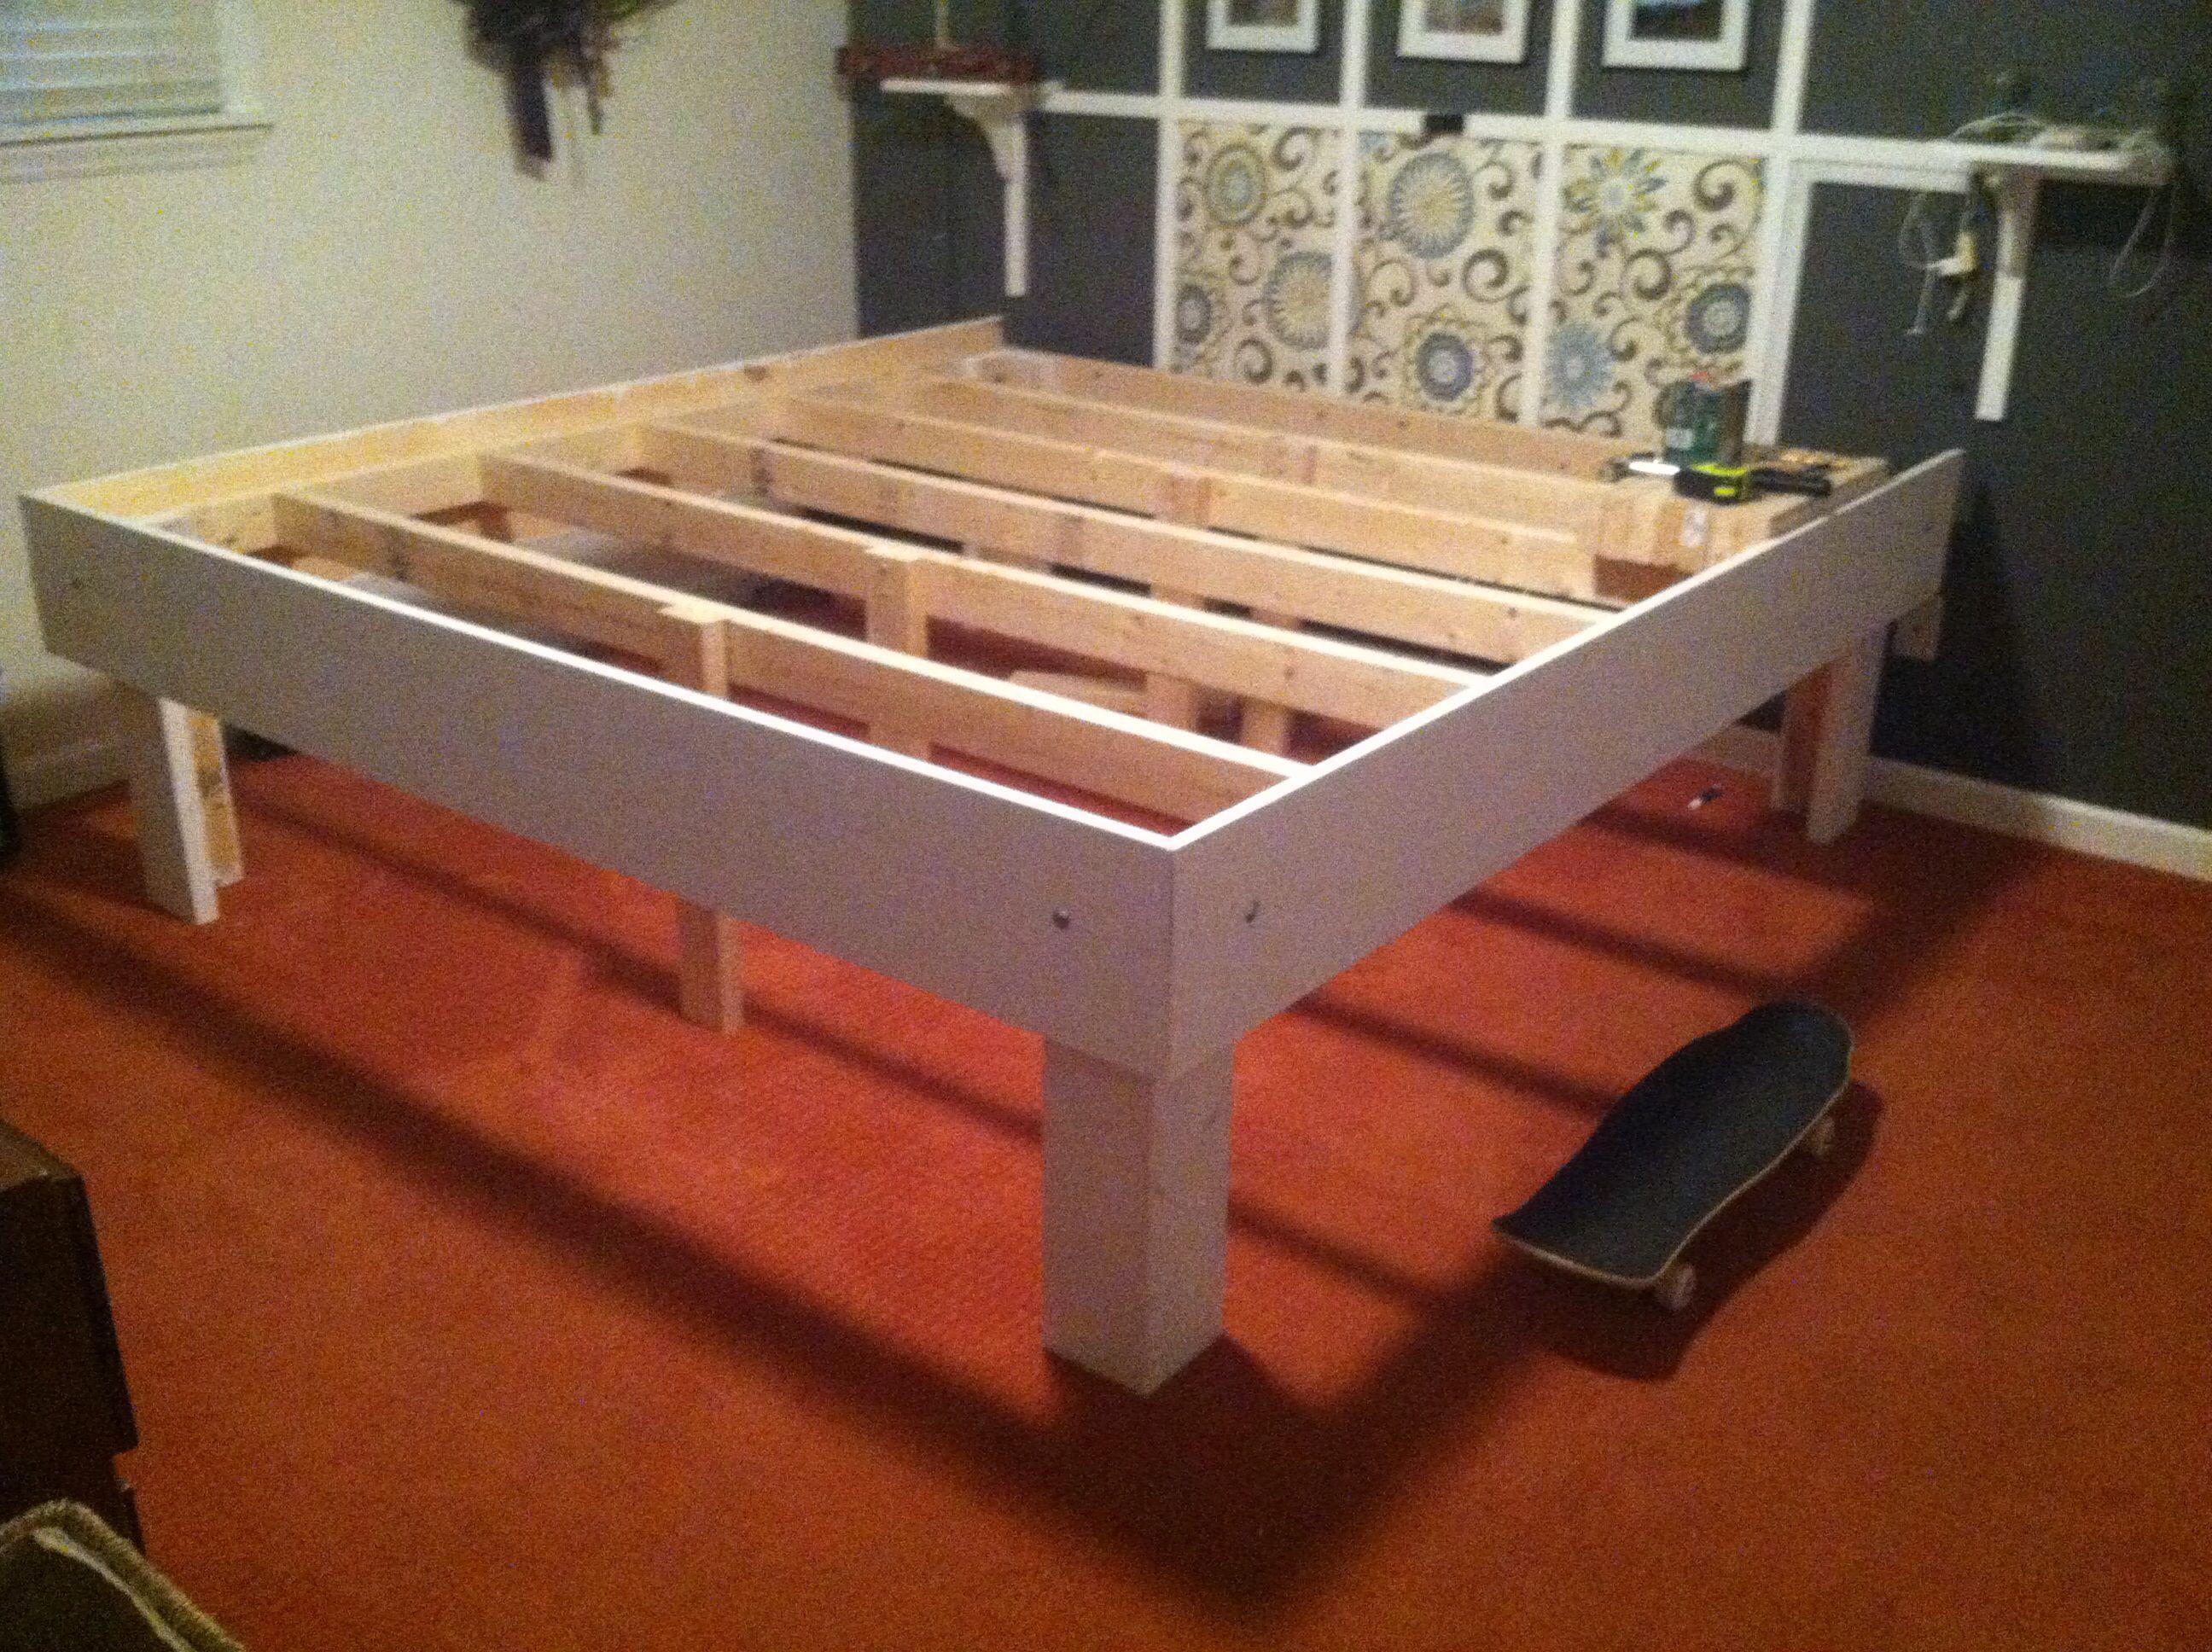 Diy Easy King Size Platform Bed With 17 Of Storage Space Underneath Diy Bed Frame Plans Diy Platform Bed Diy King Bed Frame